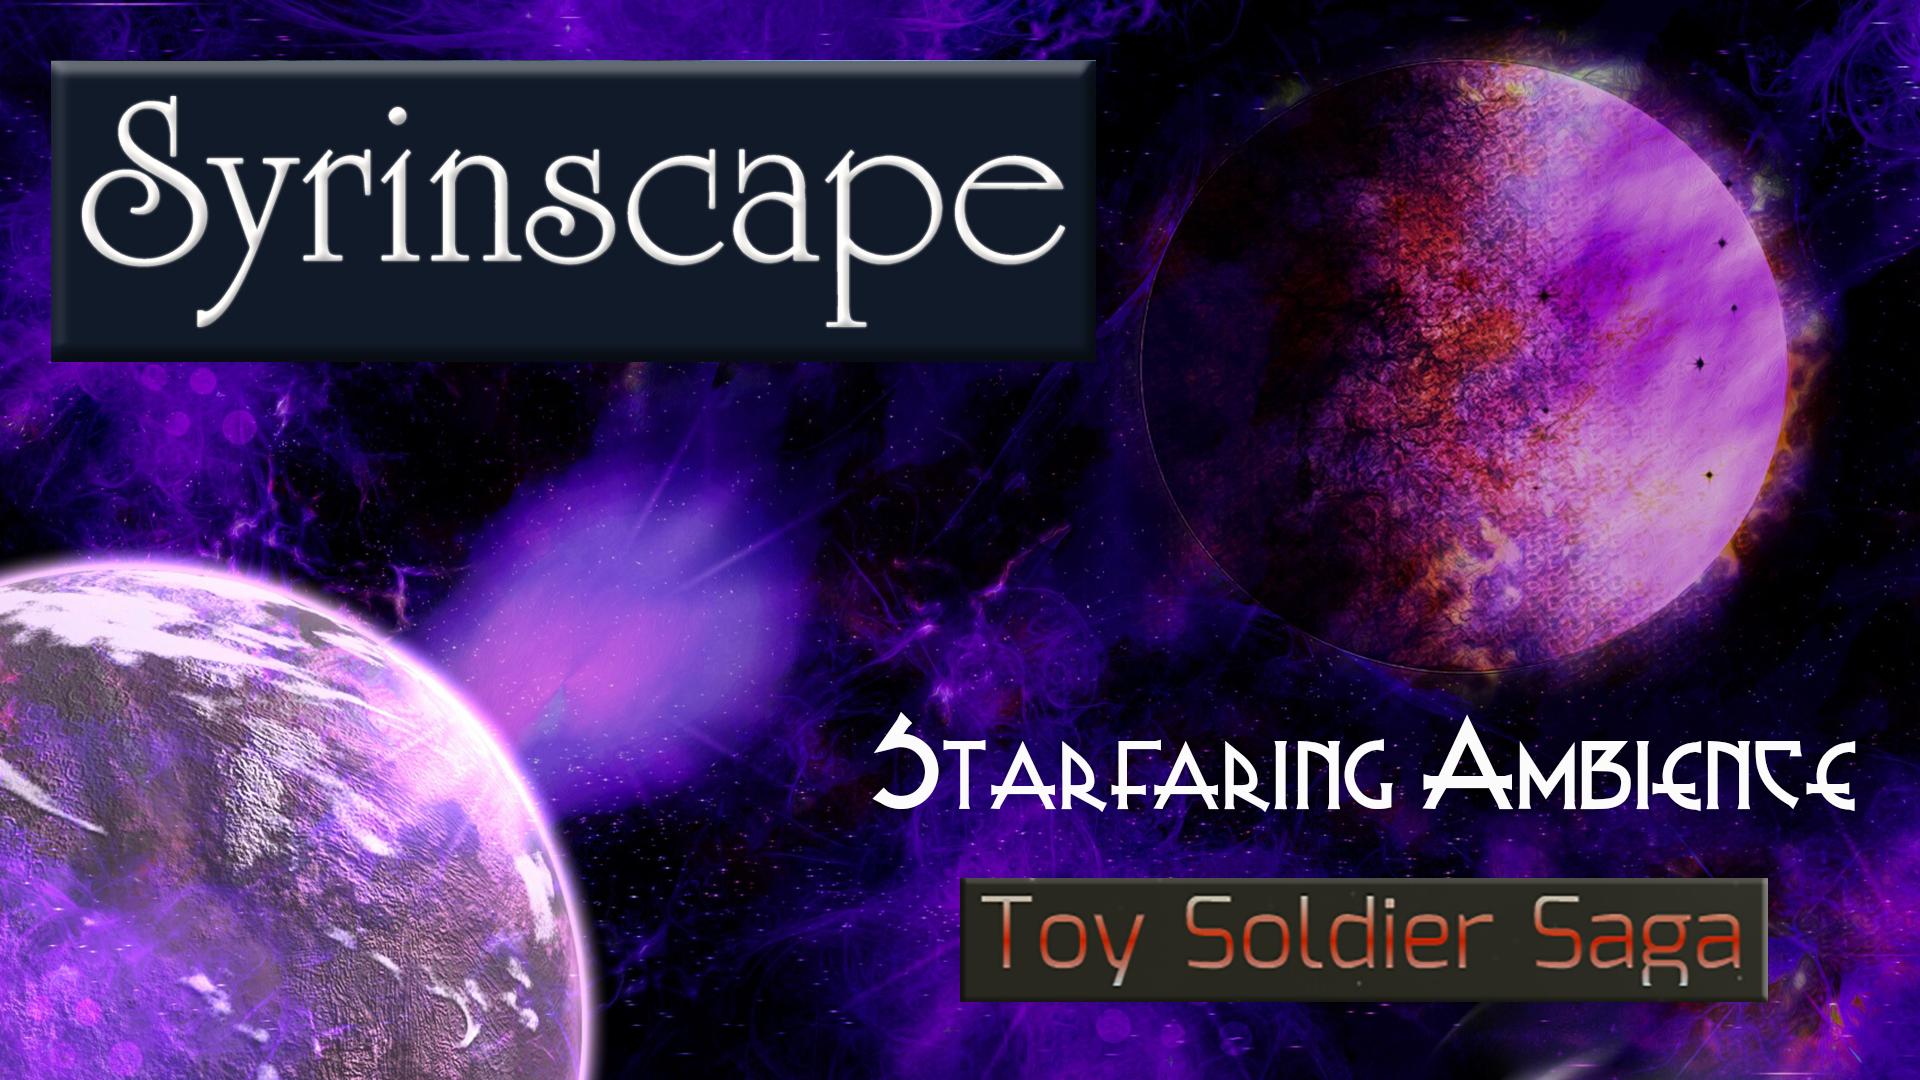 Starfaring Ambience (Toy Soldier Saga)